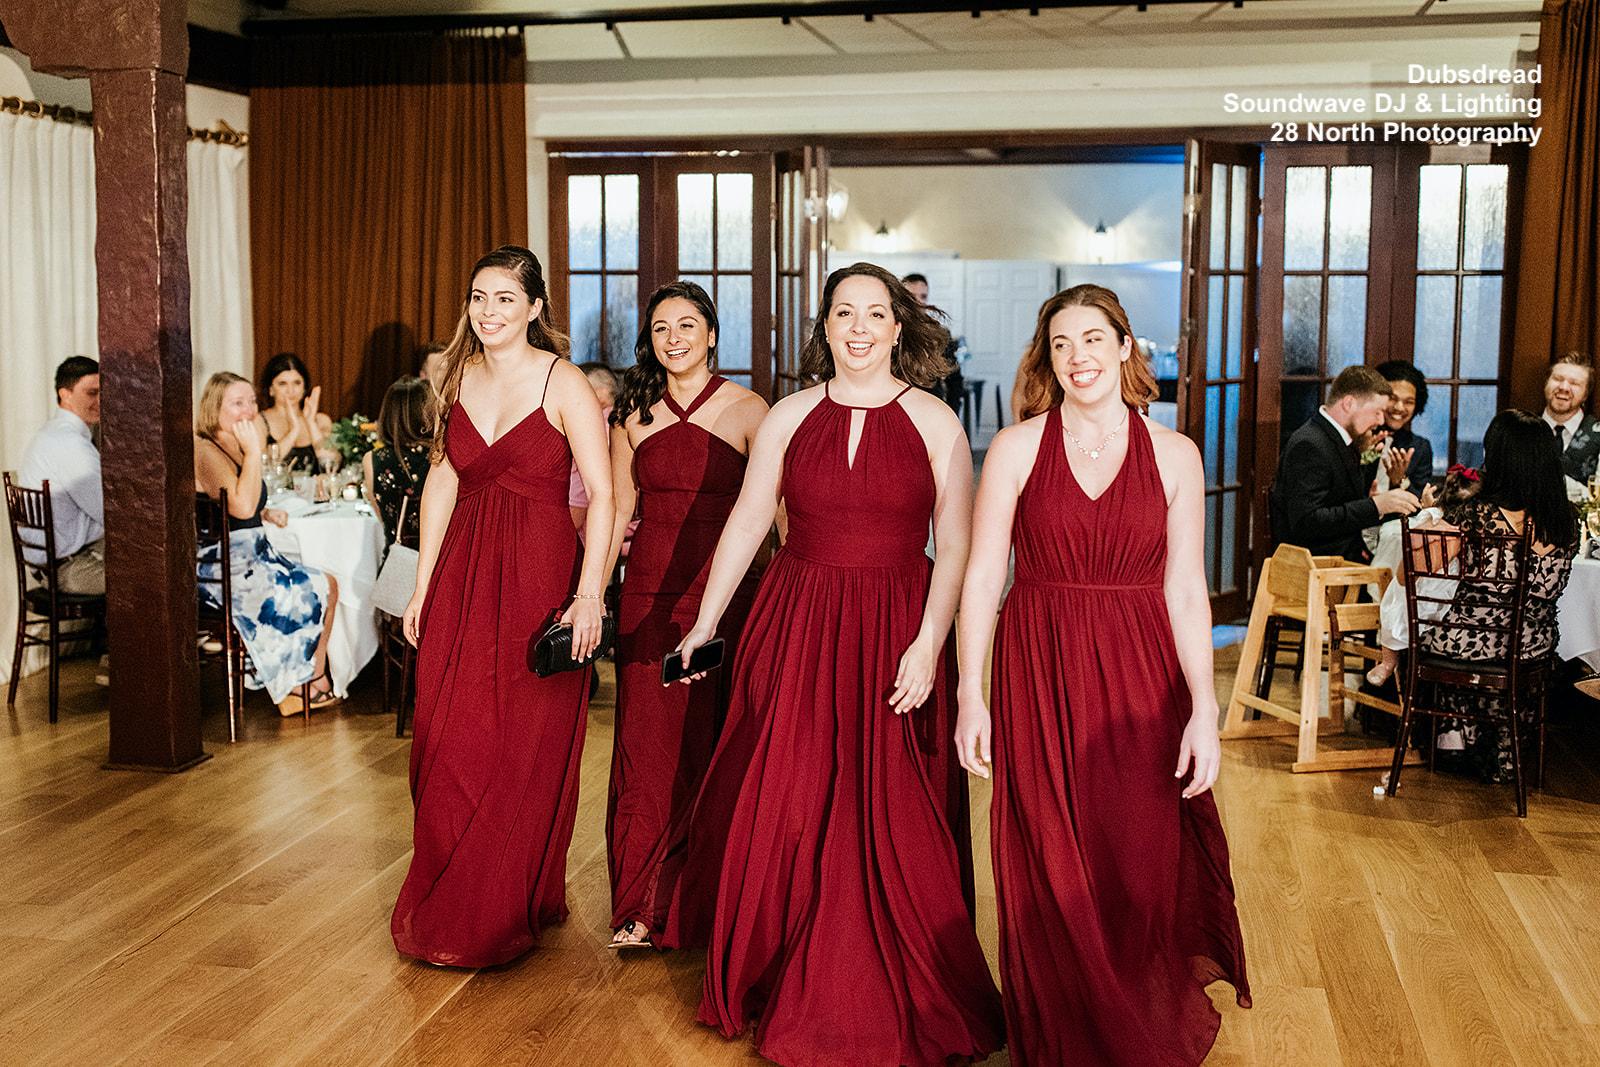 Dubsdread Soundwave Wedding Bridesmaids